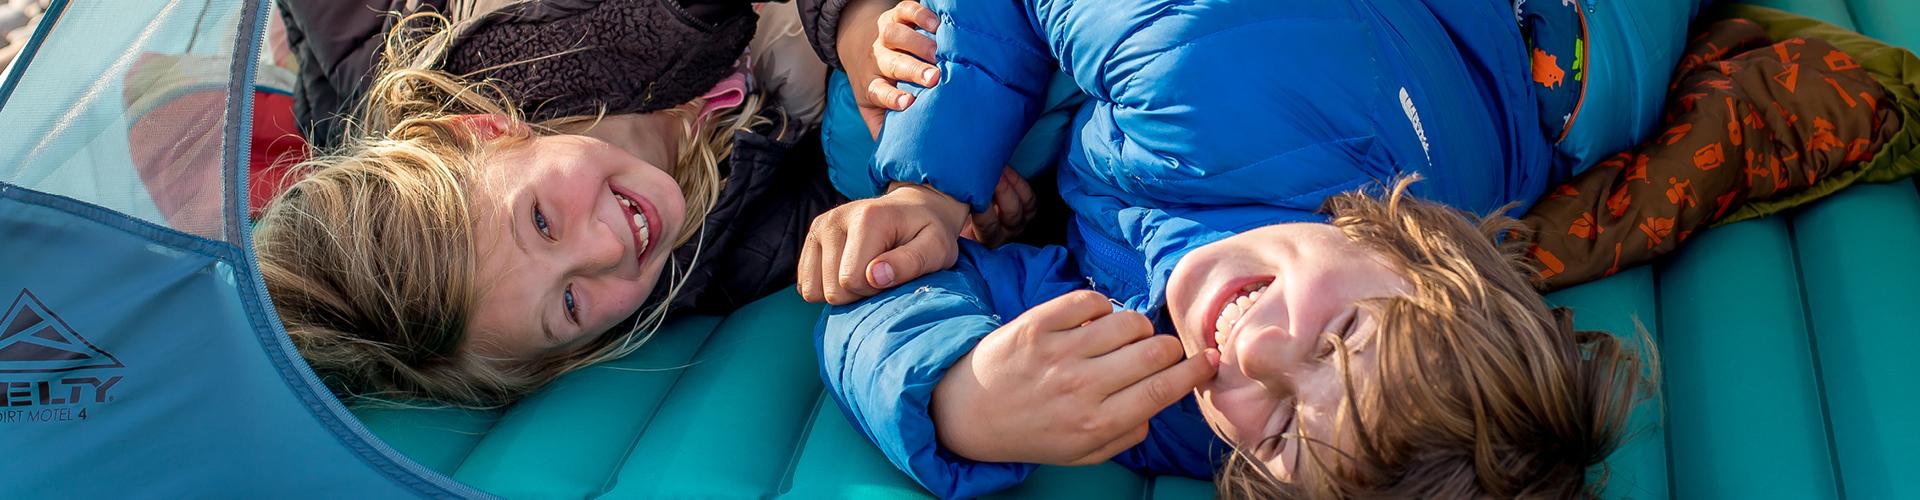 kl-landingpage-familycamping.jpg